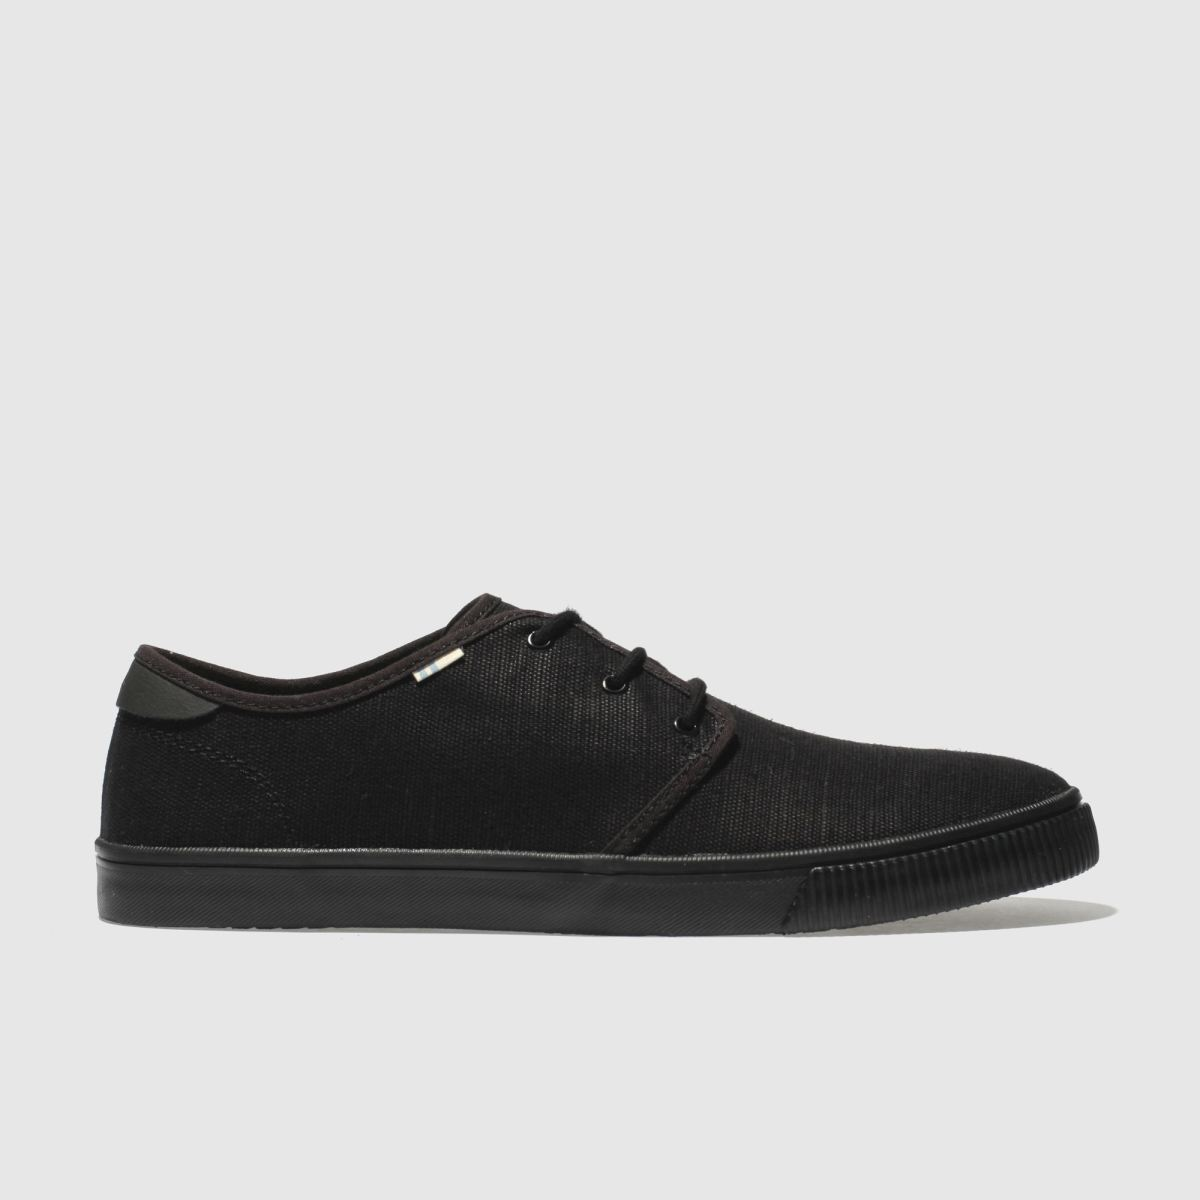 Toms Black Carlo Shoes